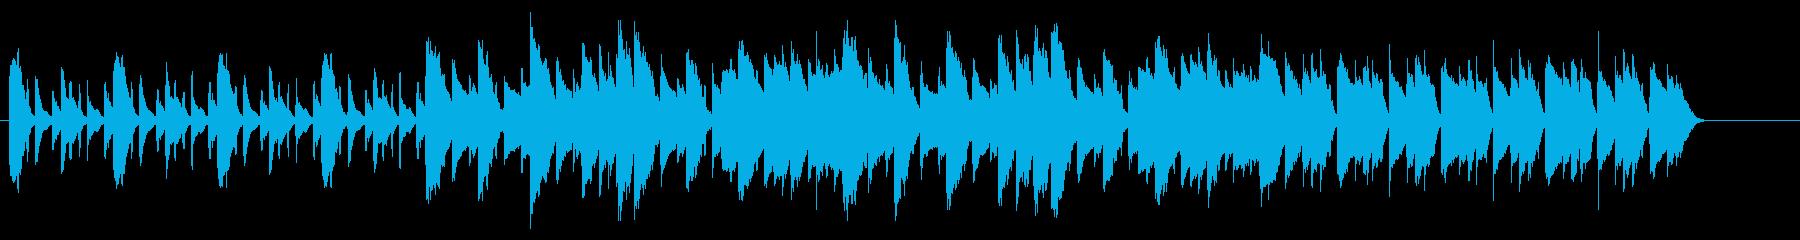 SNS広告 ピアノメイン ミニマル1の再生済みの波形